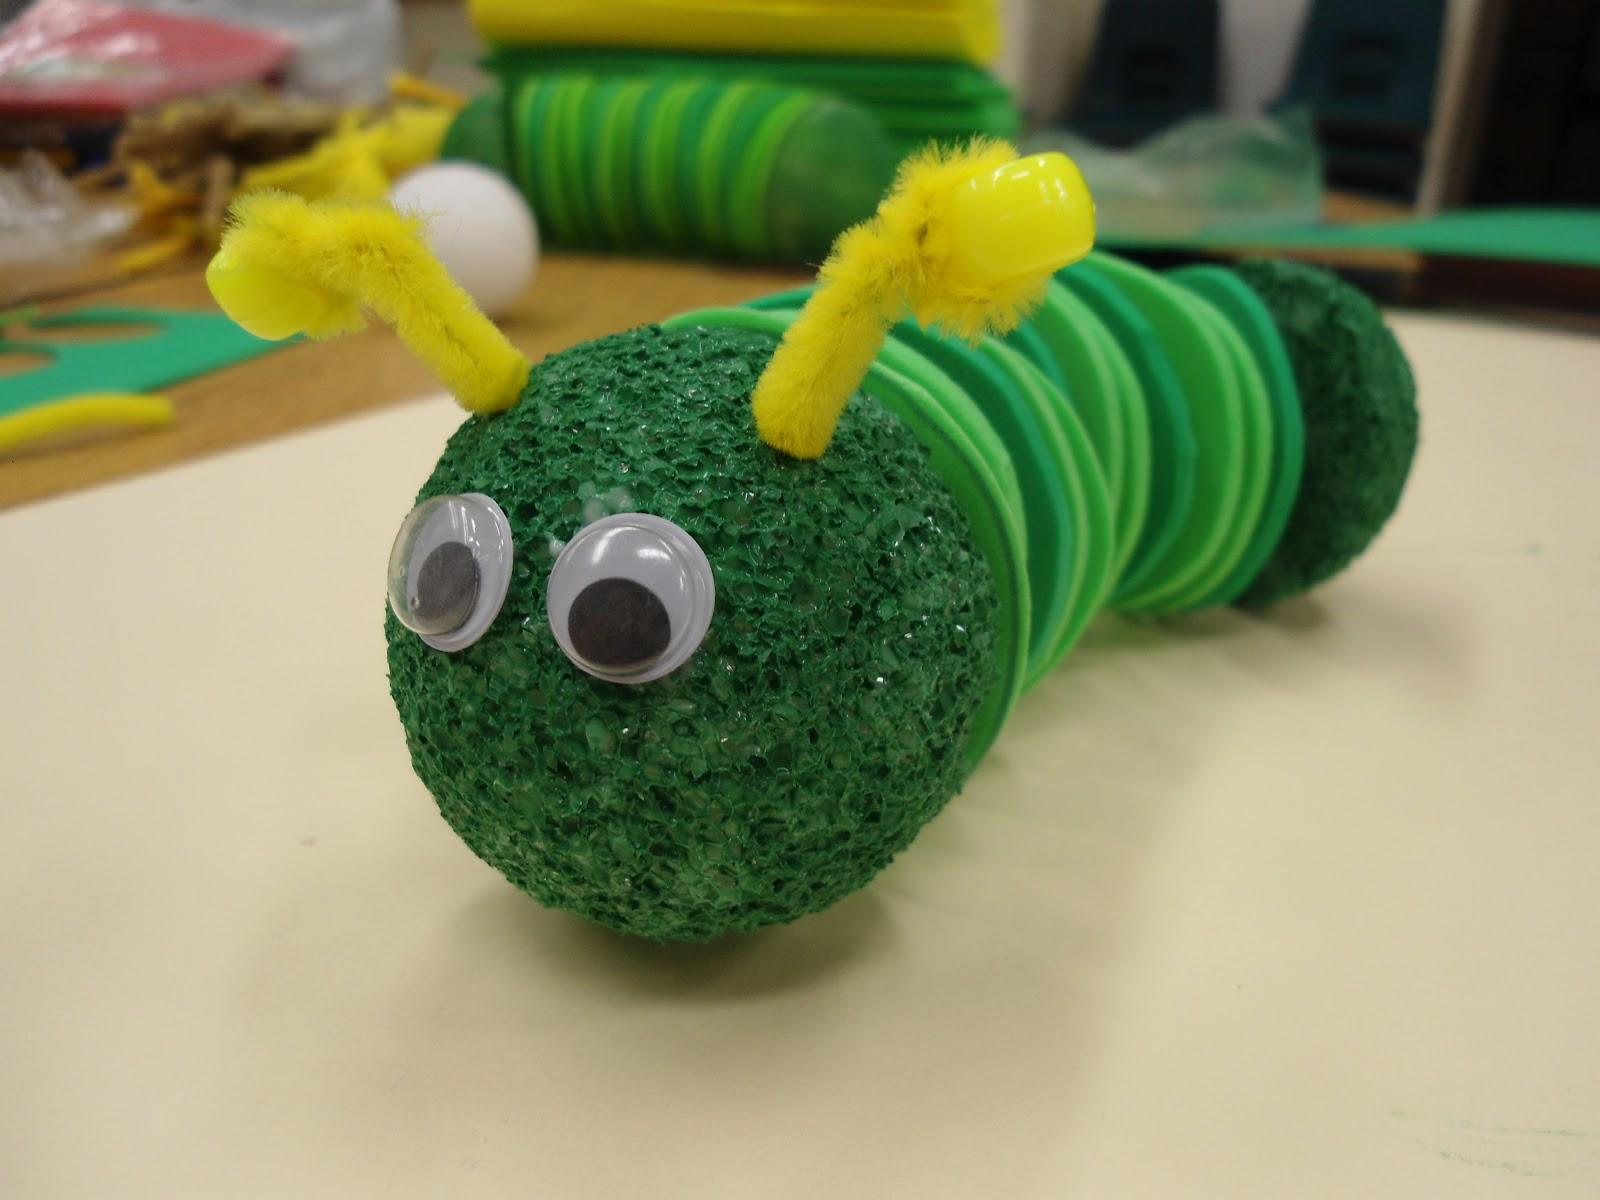 miss minor 39 s munchkins caterpillar craft. Black Bedroom Furniture Sets. Home Design Ideas